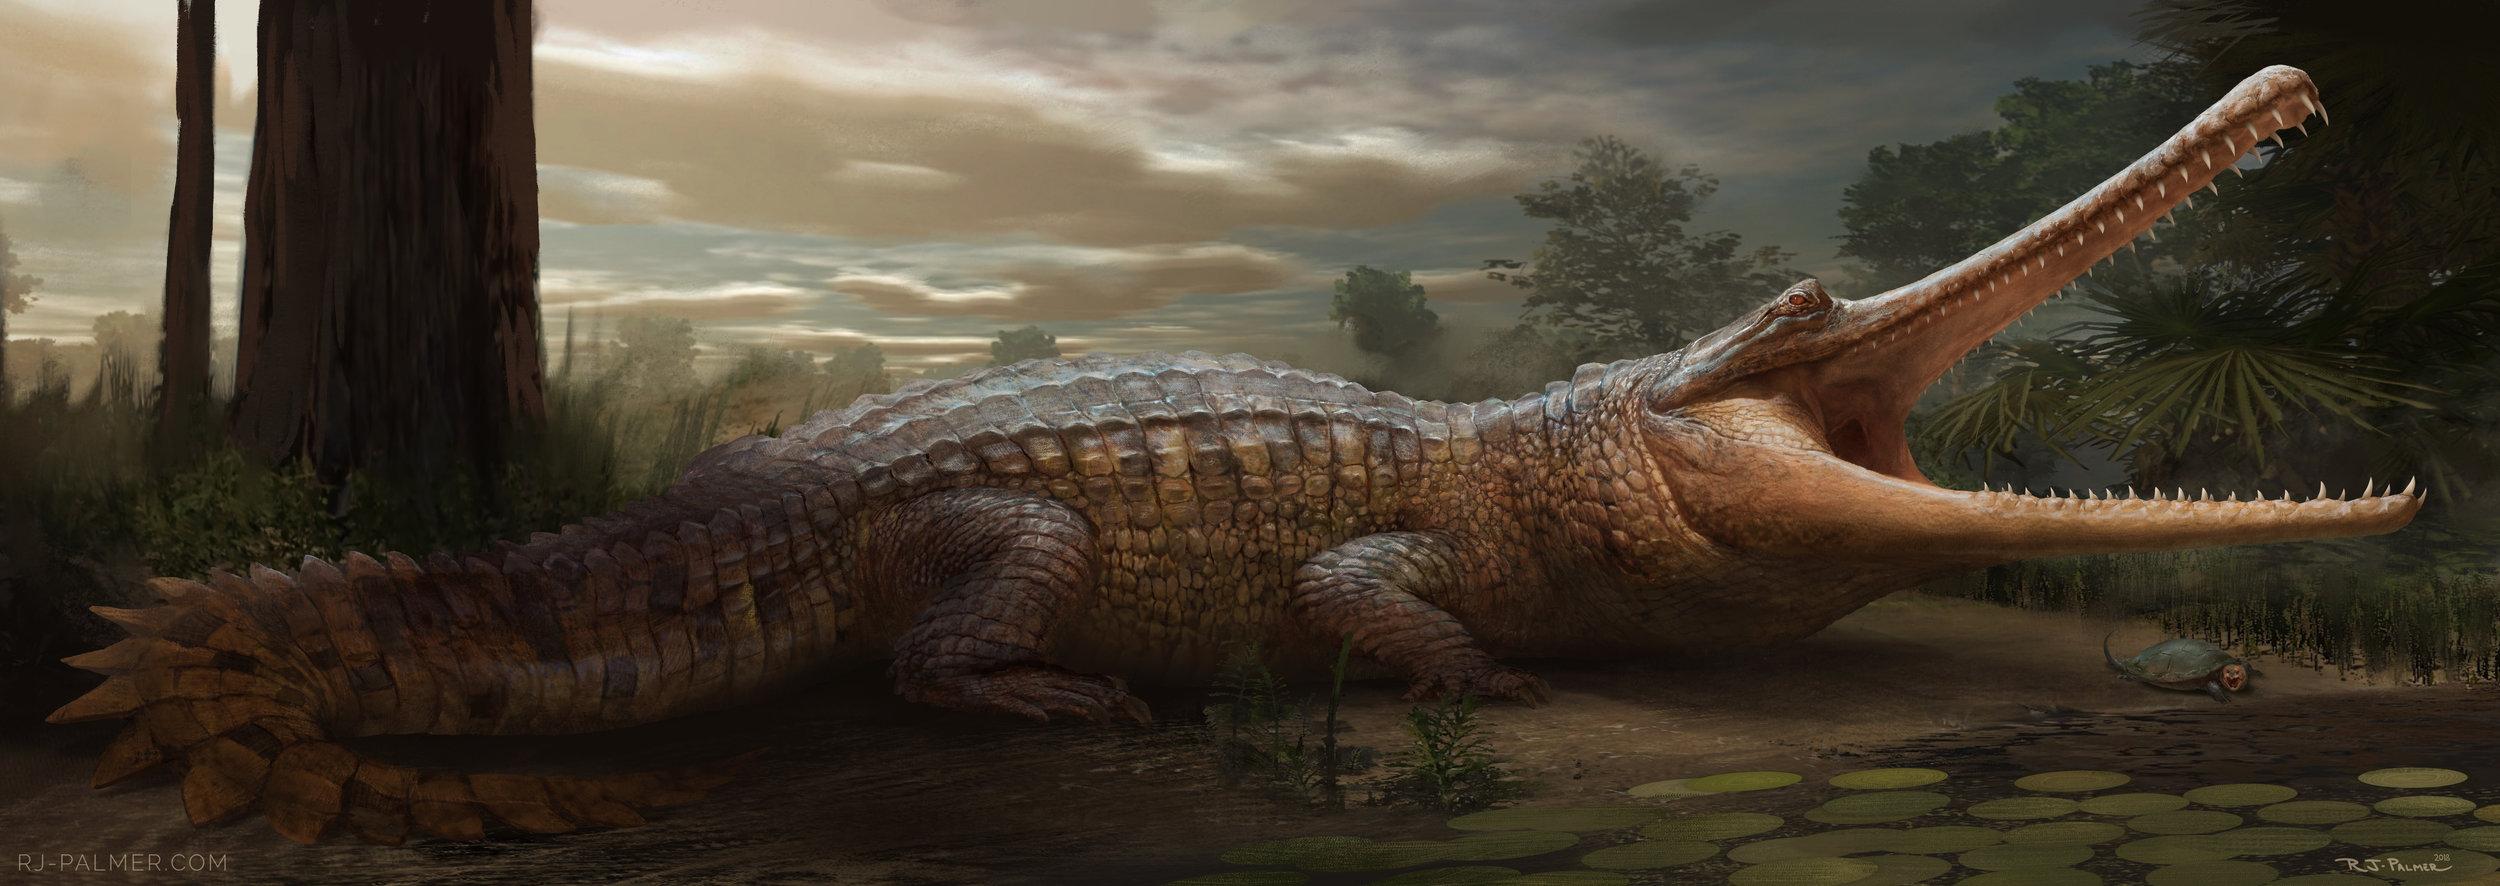 rjpalmer_thoracosaurus_005.jpg